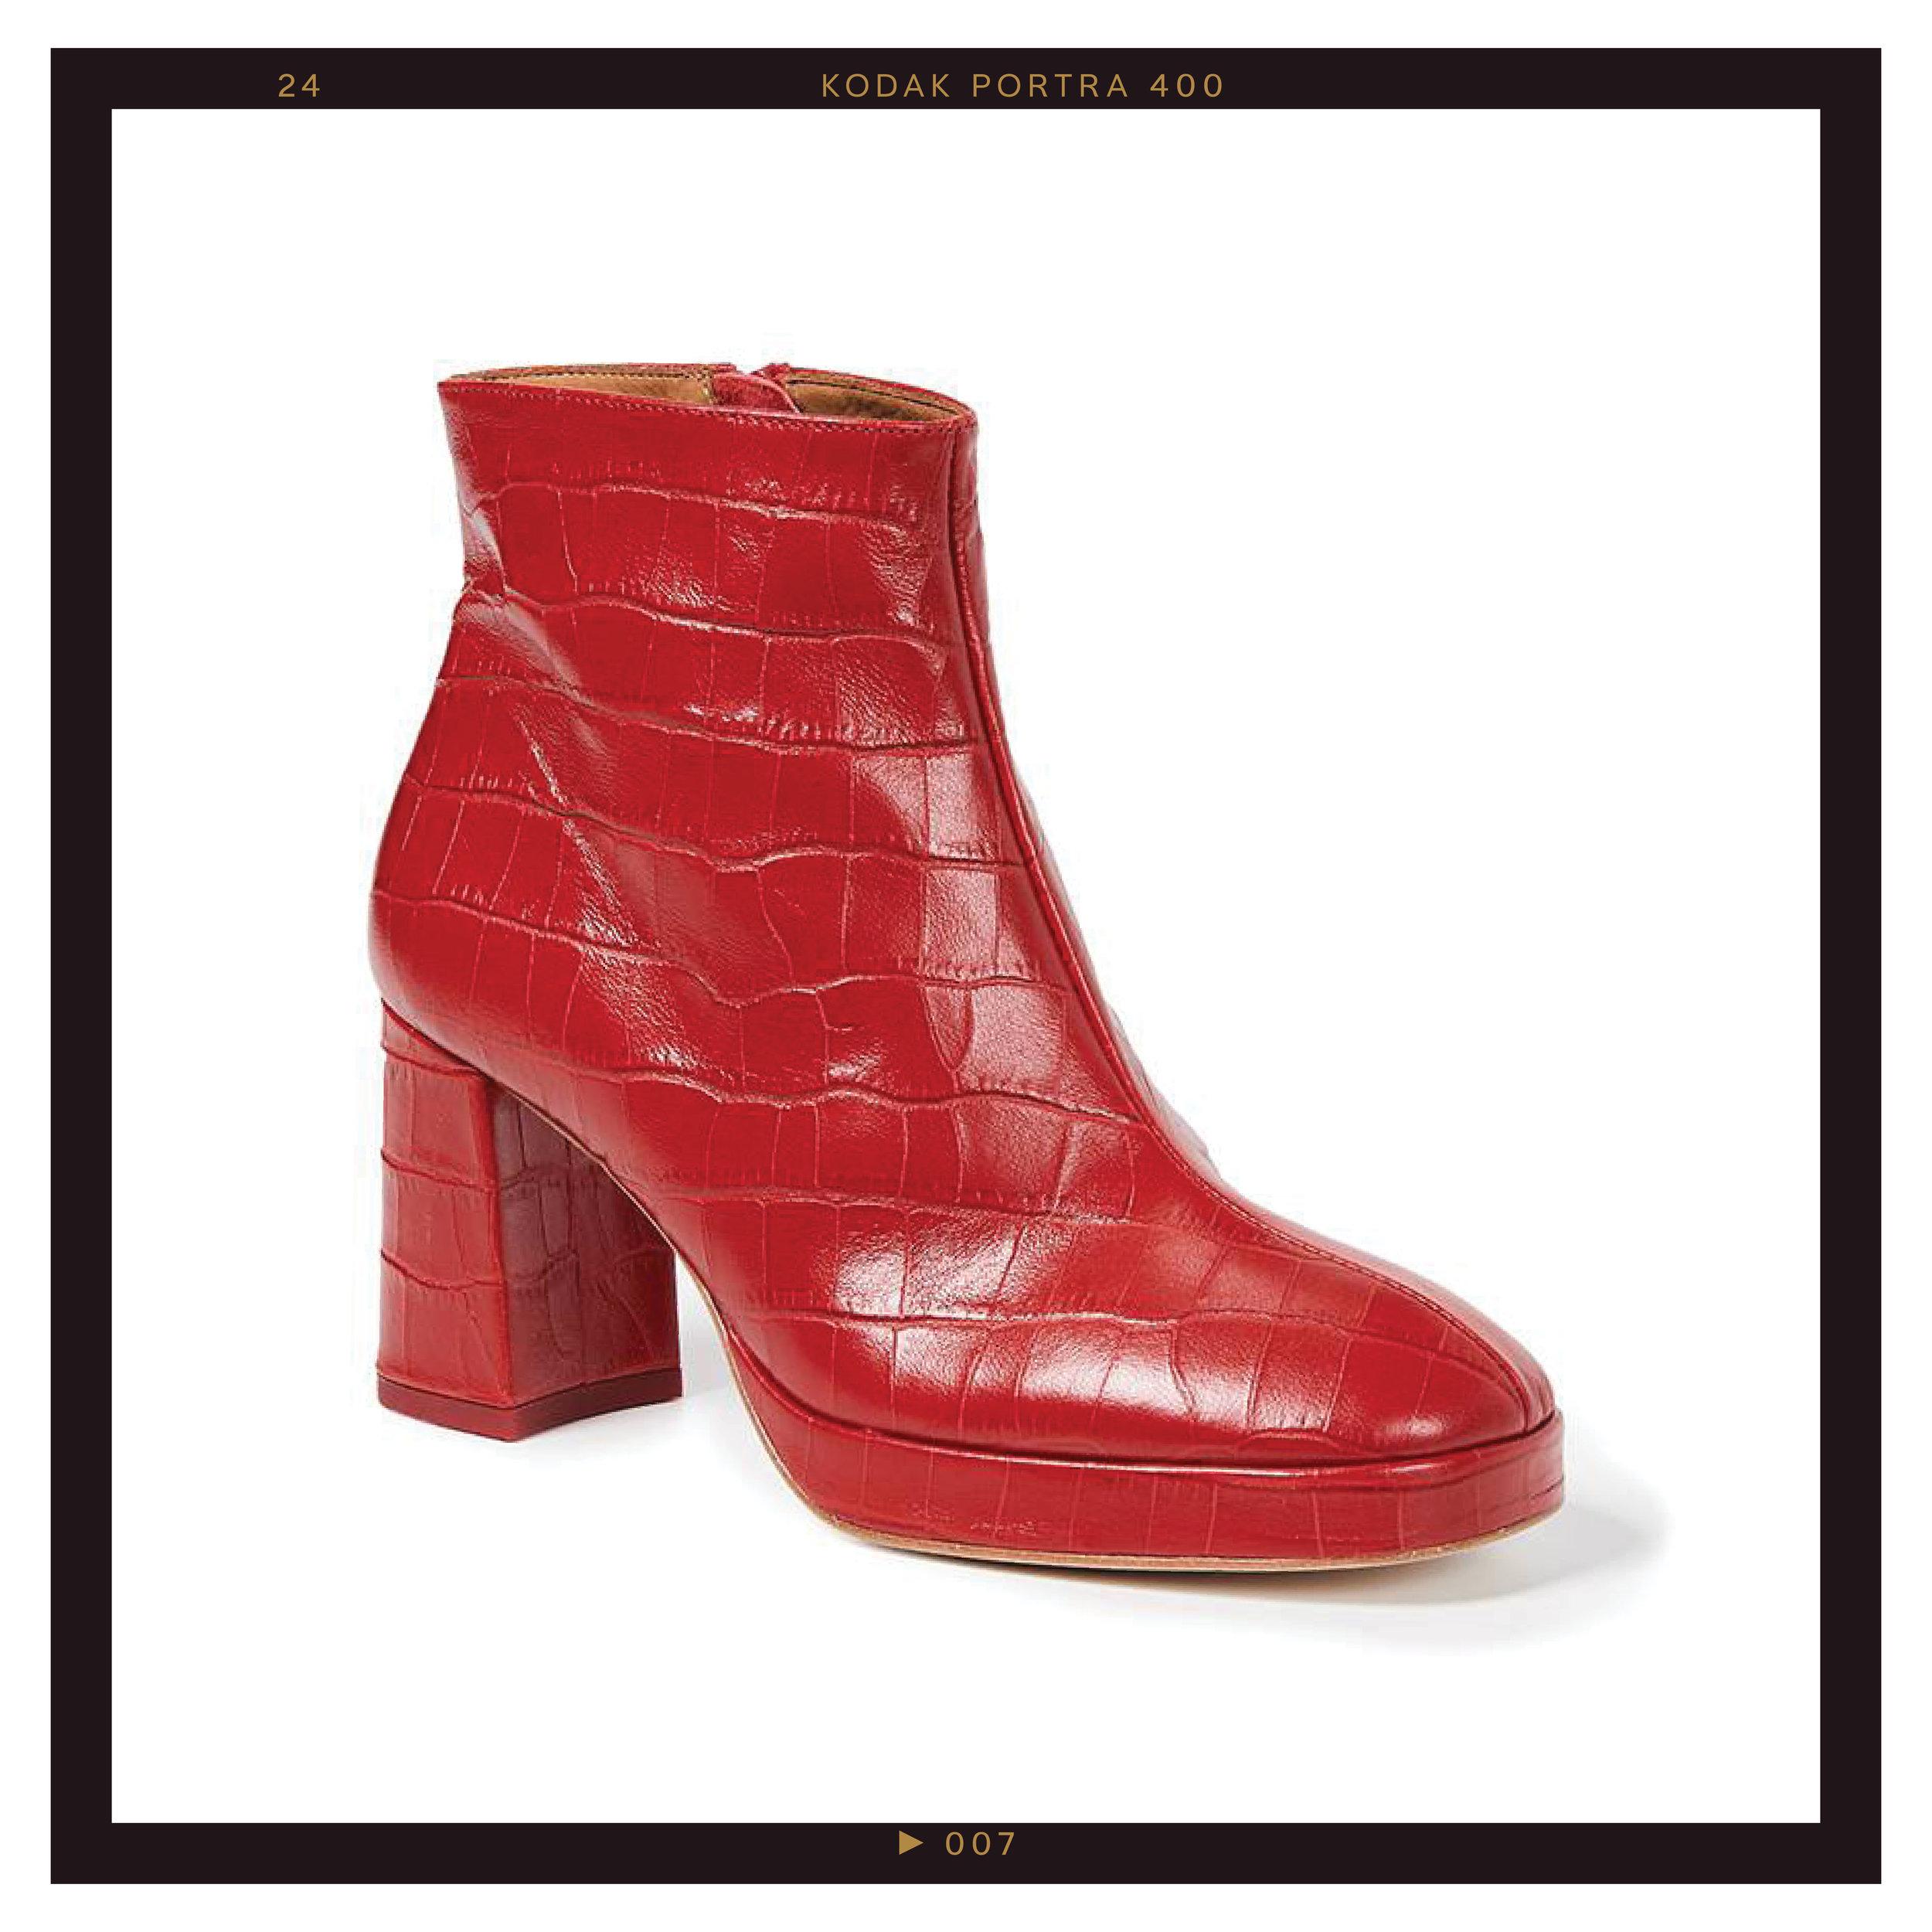 Miista Edith Platform Booties, $365